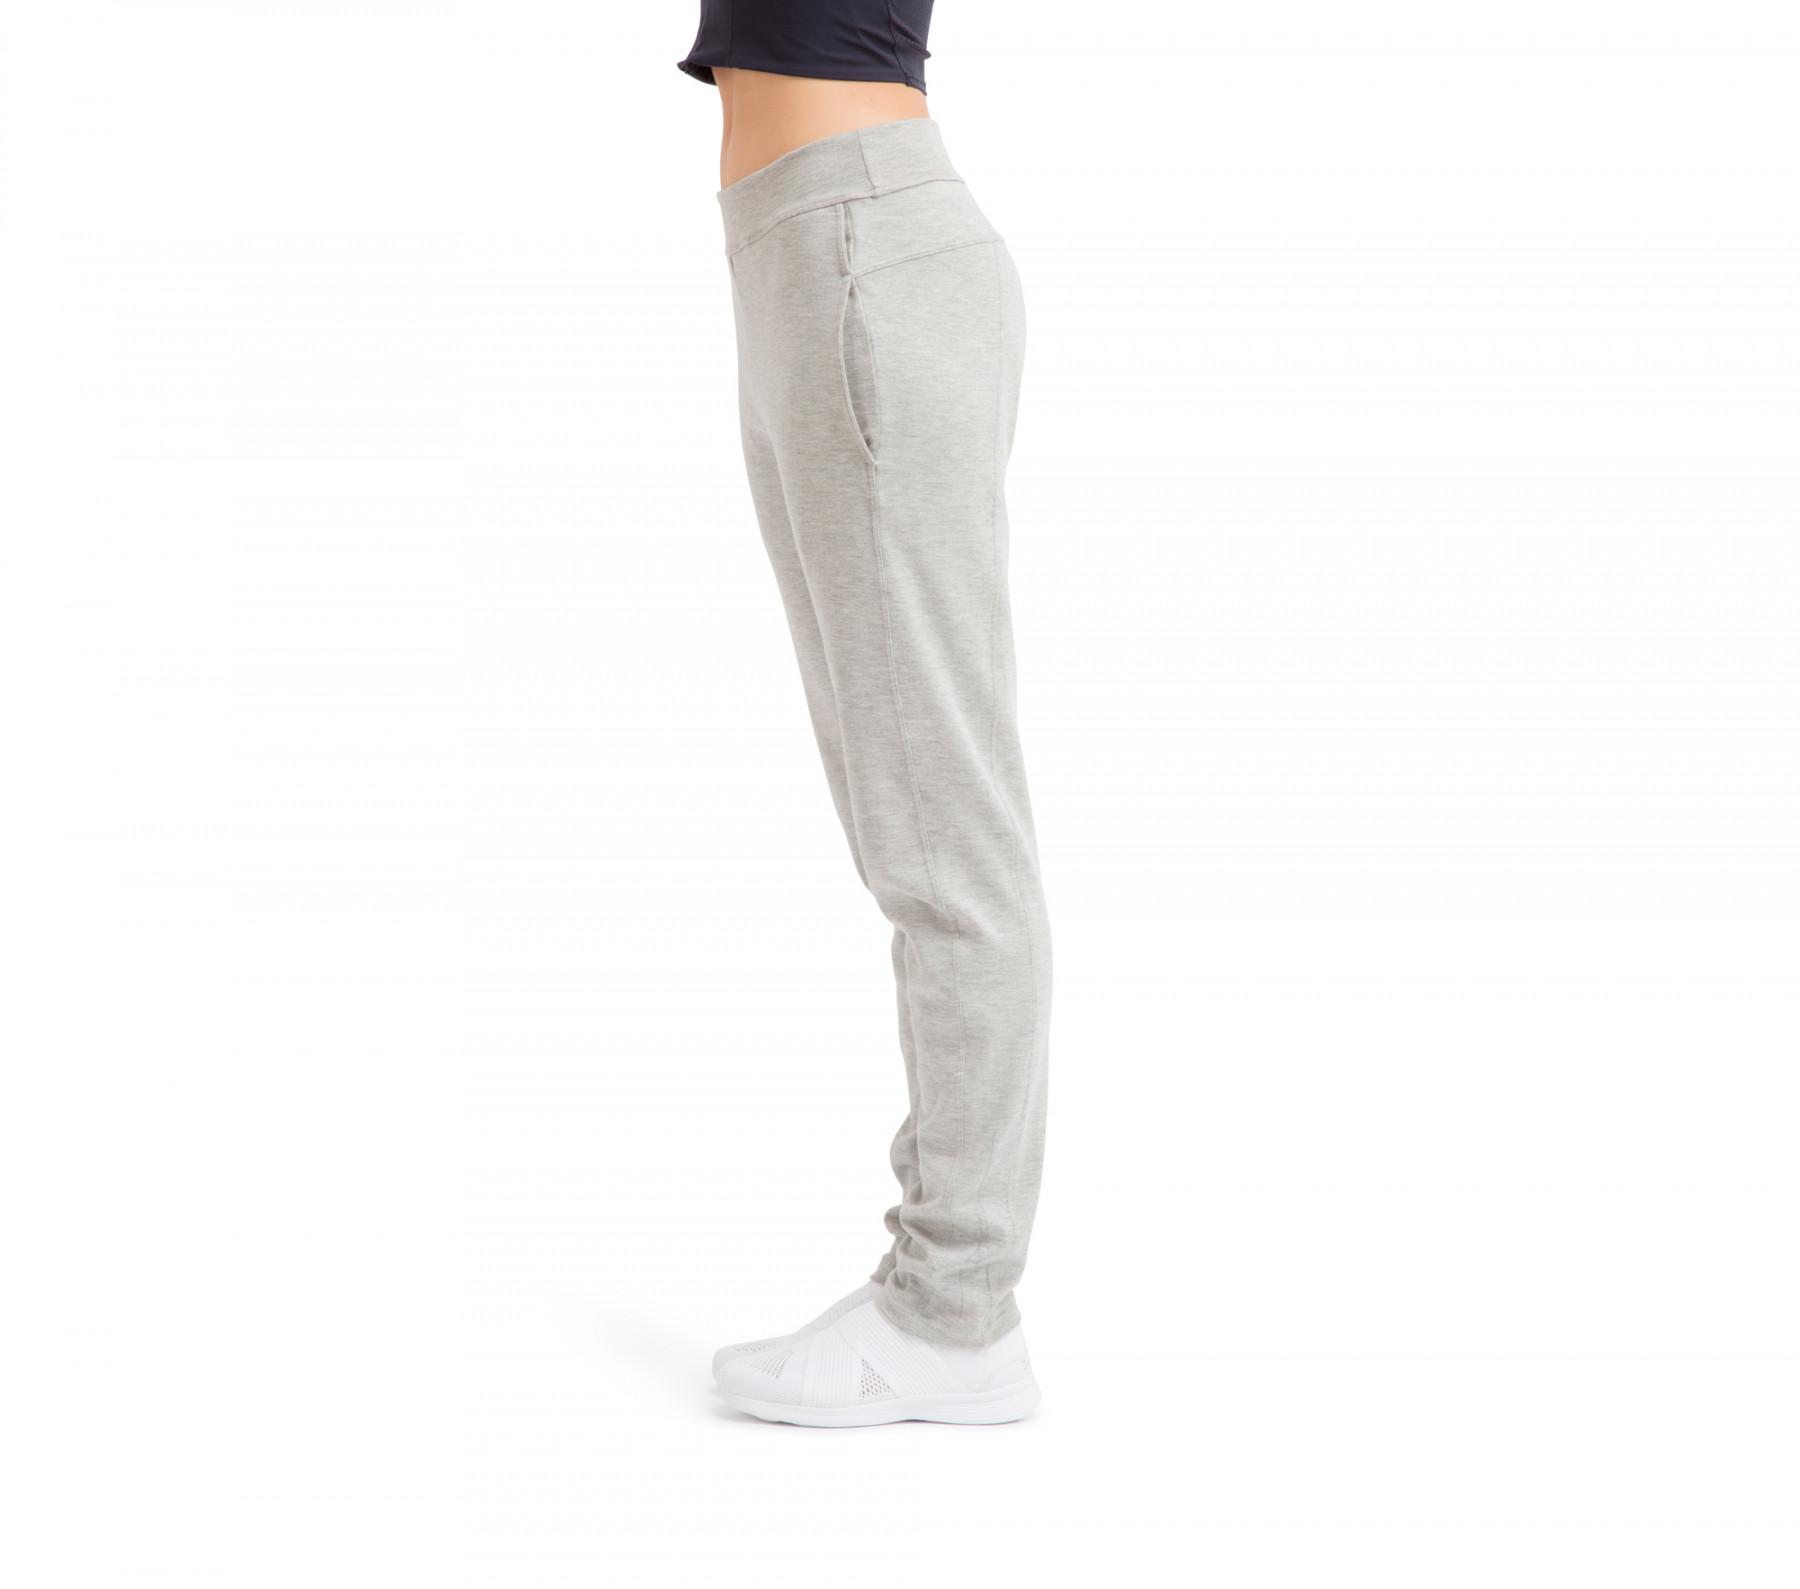 Pantalone a gamba dritta in maglia